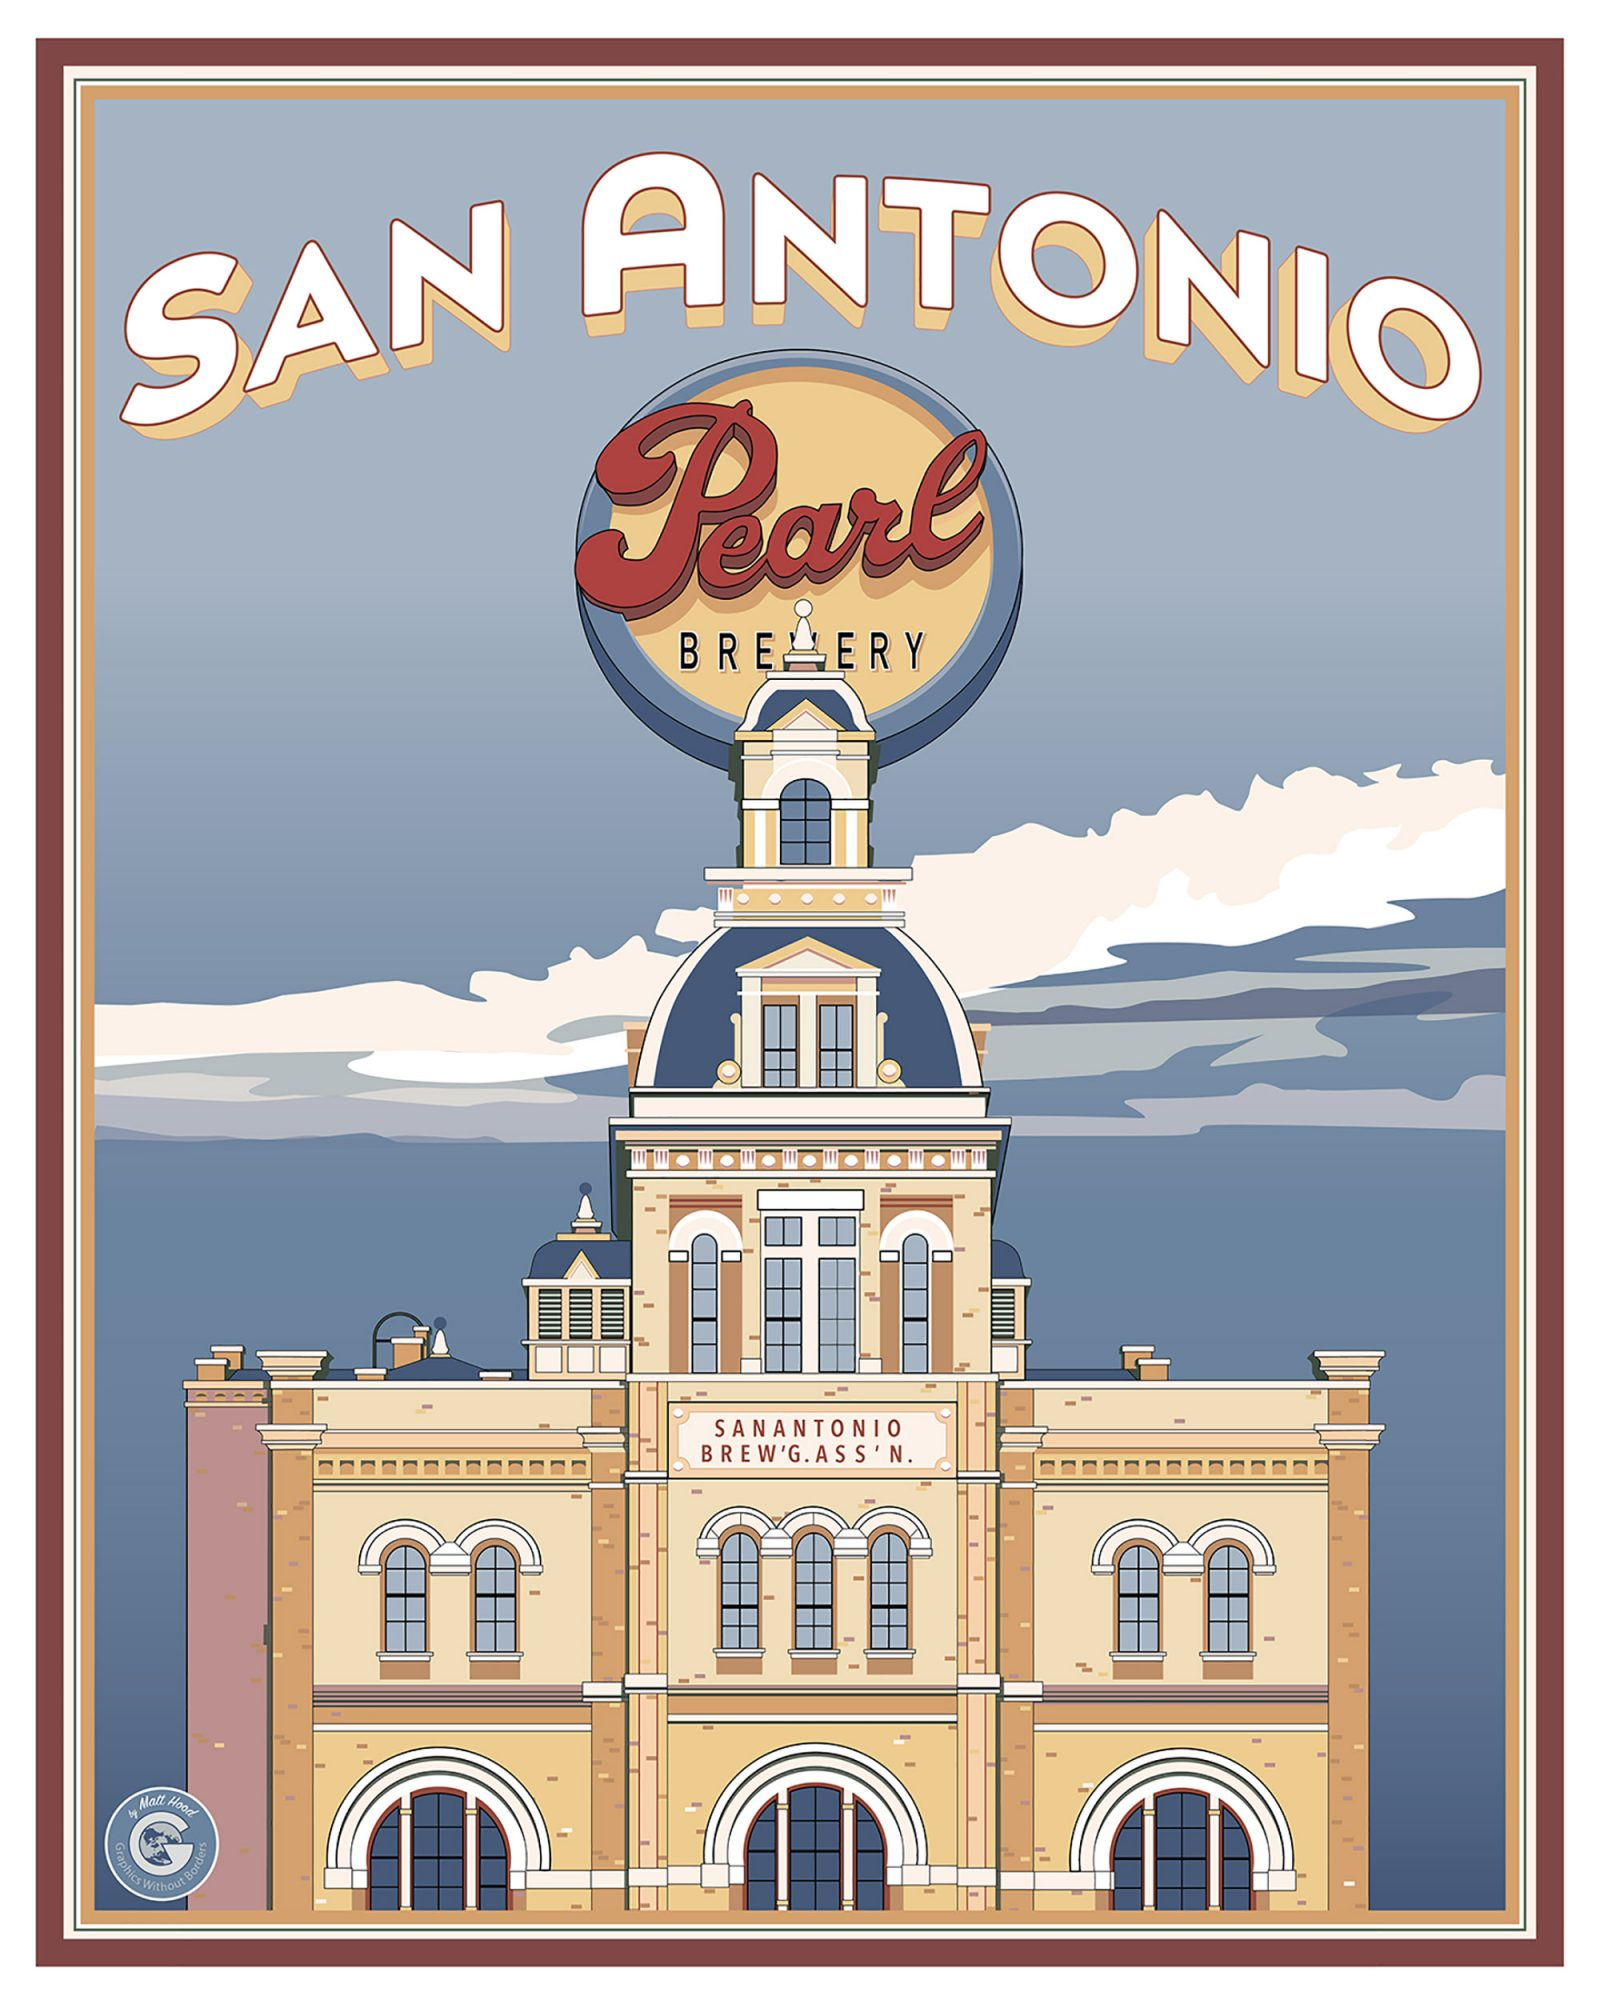 San Antonio's Pearl - The Brewhouse